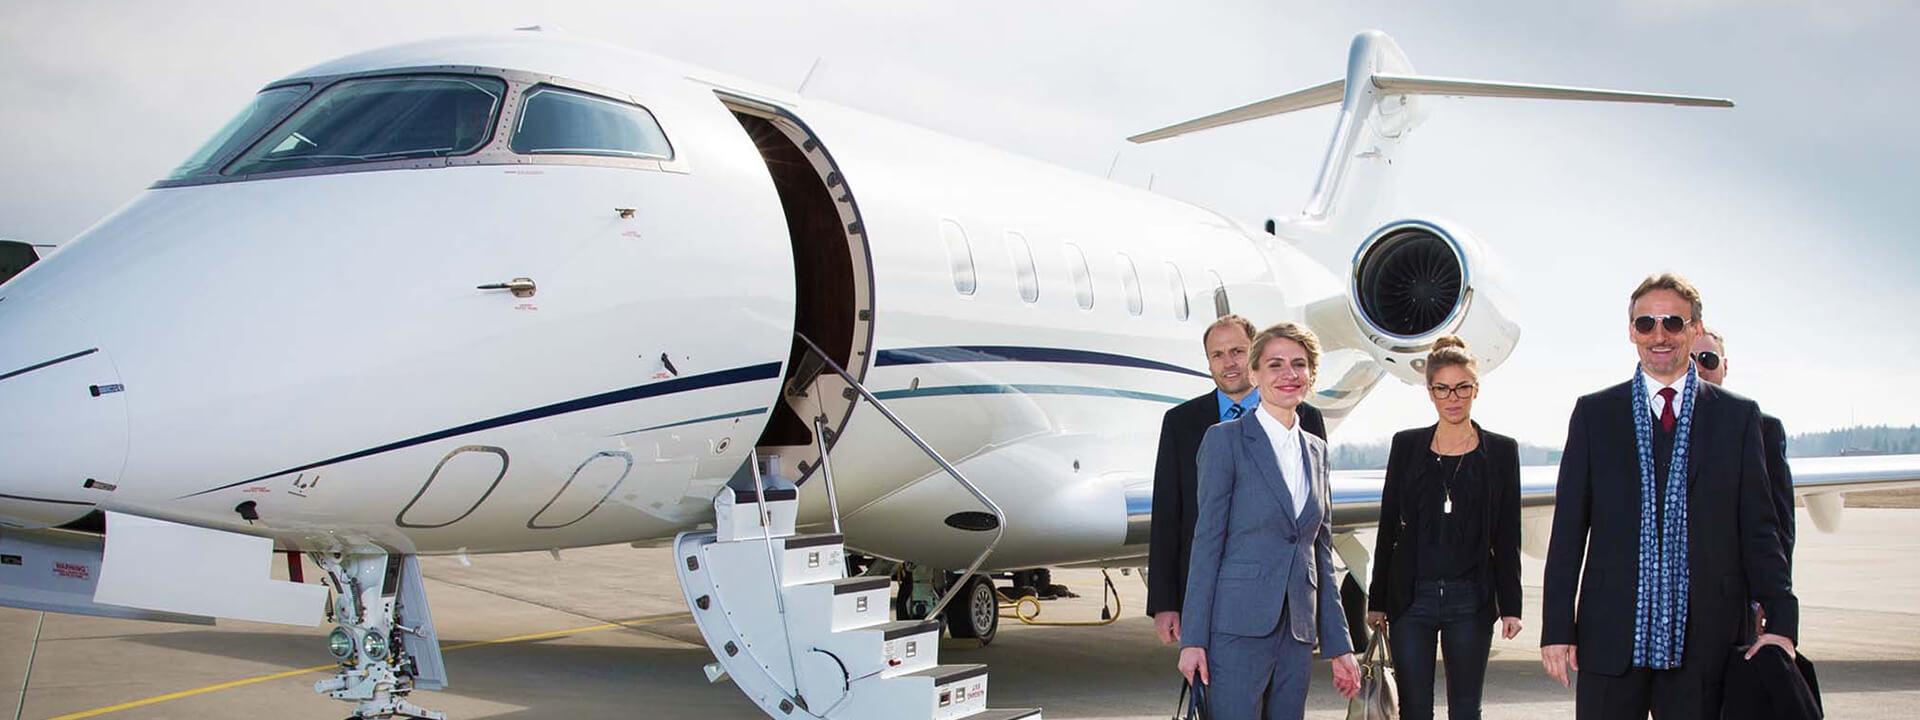 Jet Privato Noleggio : Voli d affari prenota con jetapp